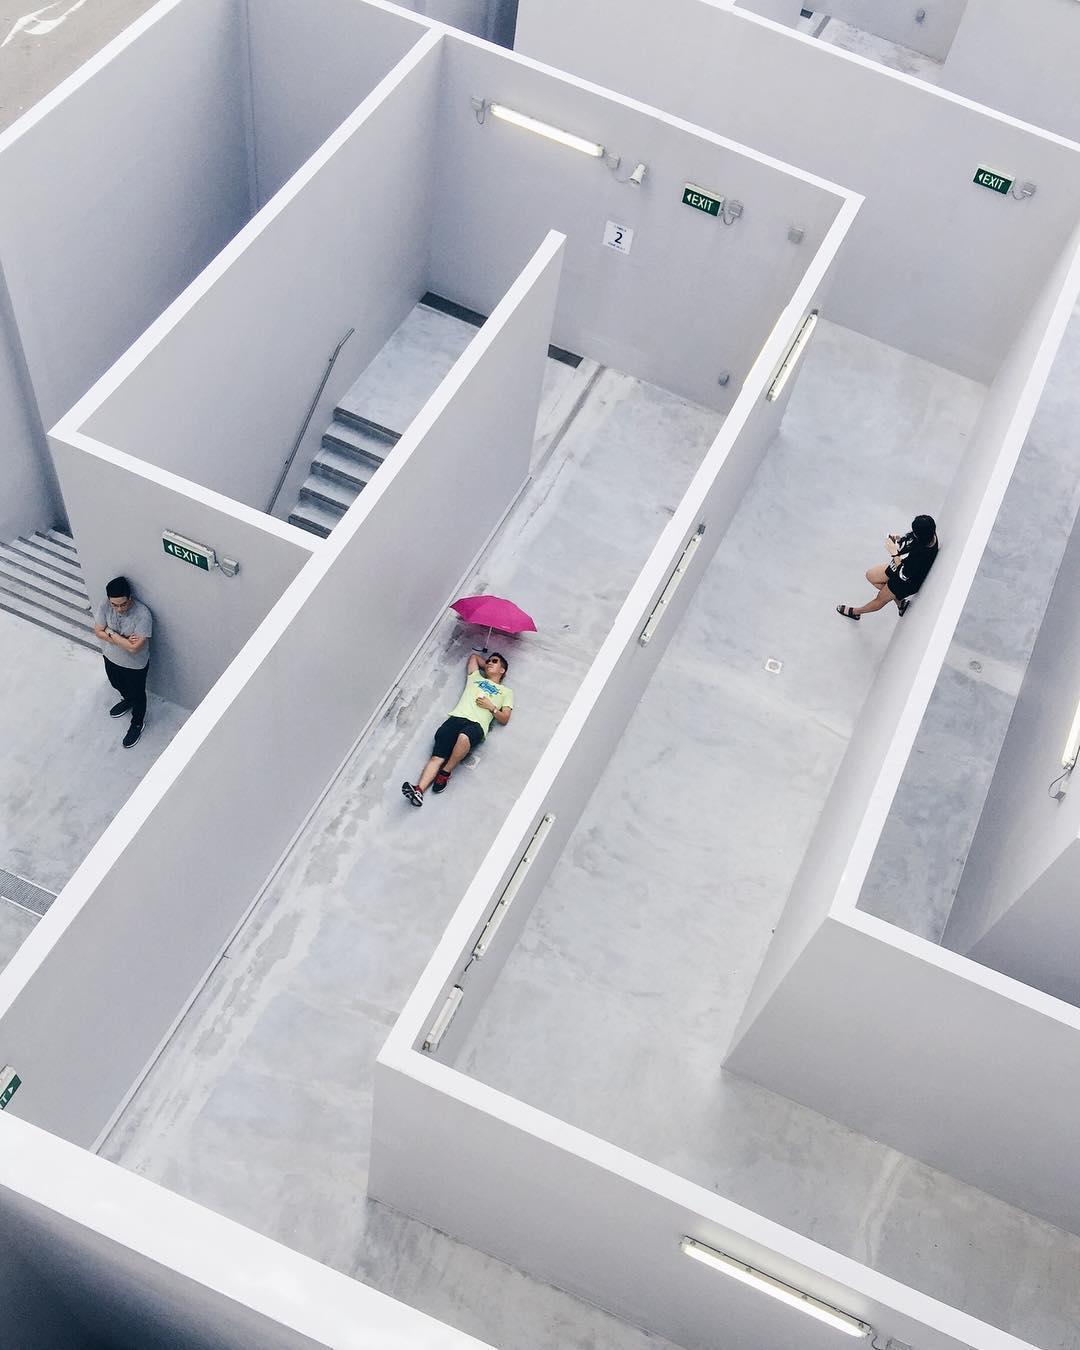 """Isn't life just a-maze-ing?"" #WHPgetlost https://t.co/3P3ELQ5iuu https://t.co/MiVTMXVZH8"